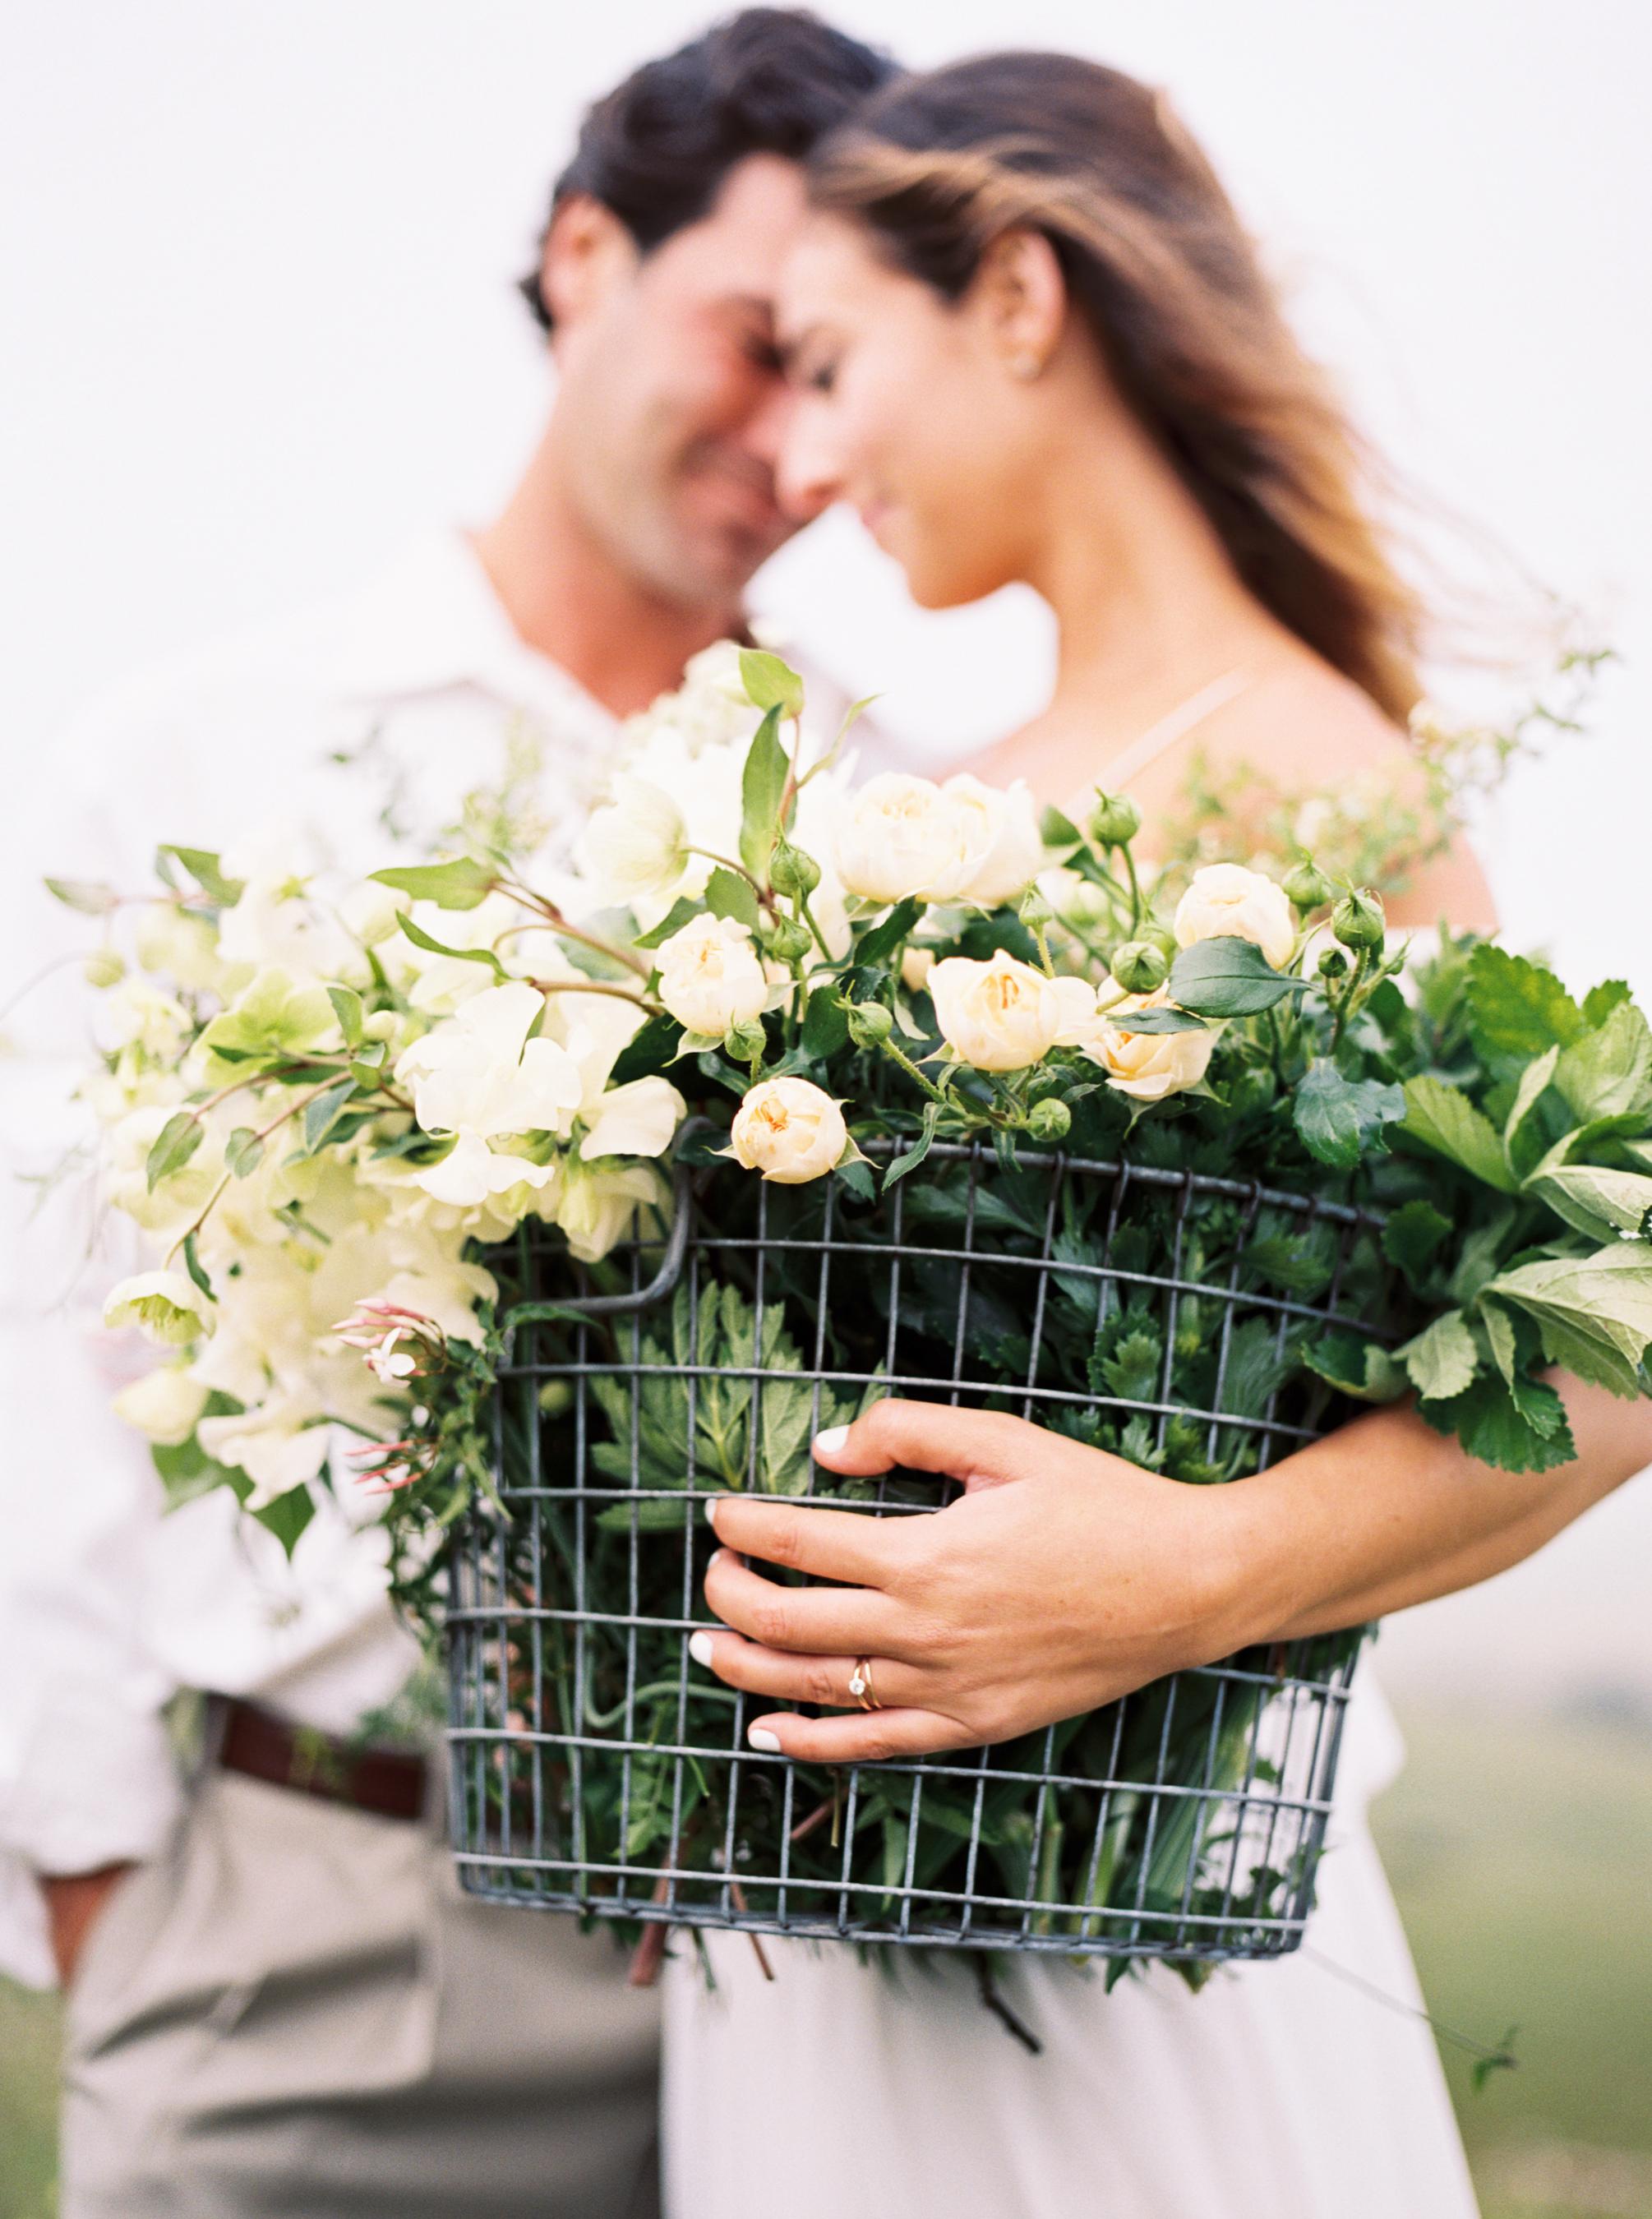 Danford-Photography-Bozeman-Montana-California-Wedding-Engagement-Photographer-47.jpg